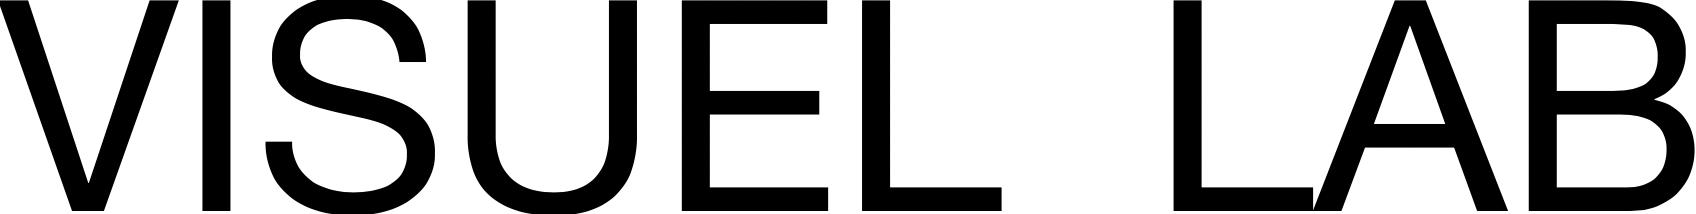 Visuel_Lab logo